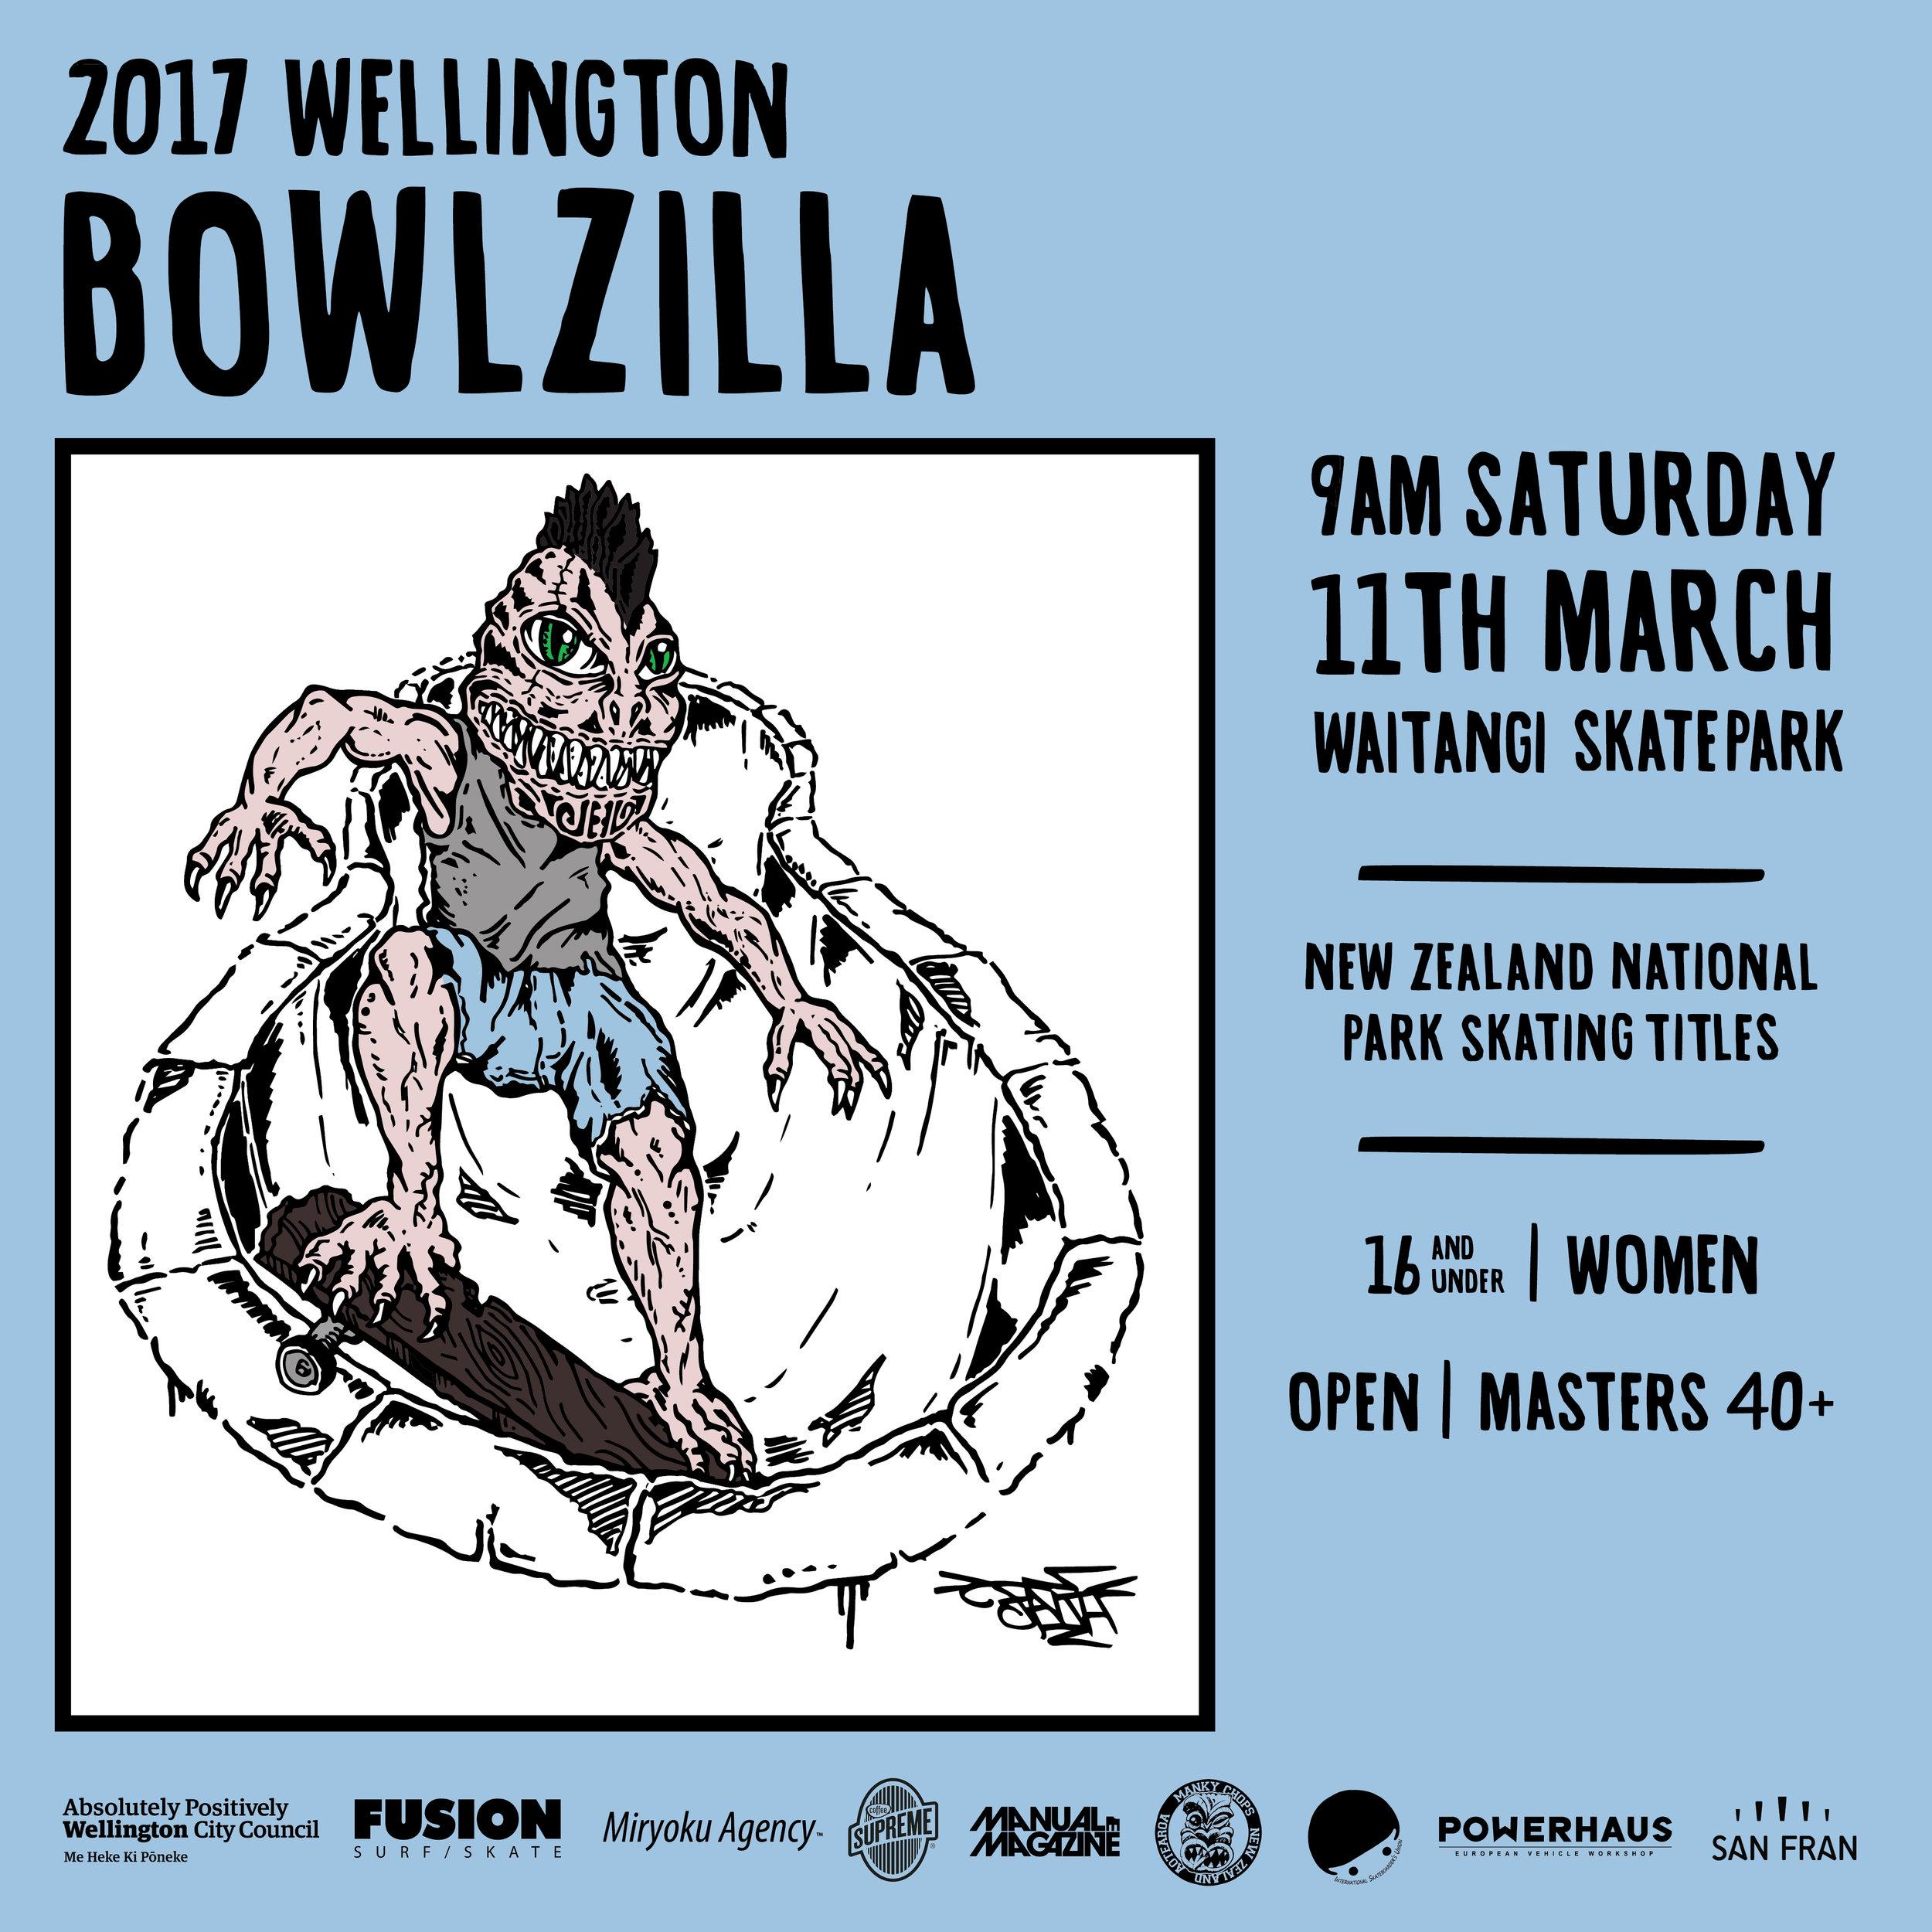 Bowlzilla_Wellington2017_Instagram.jpg